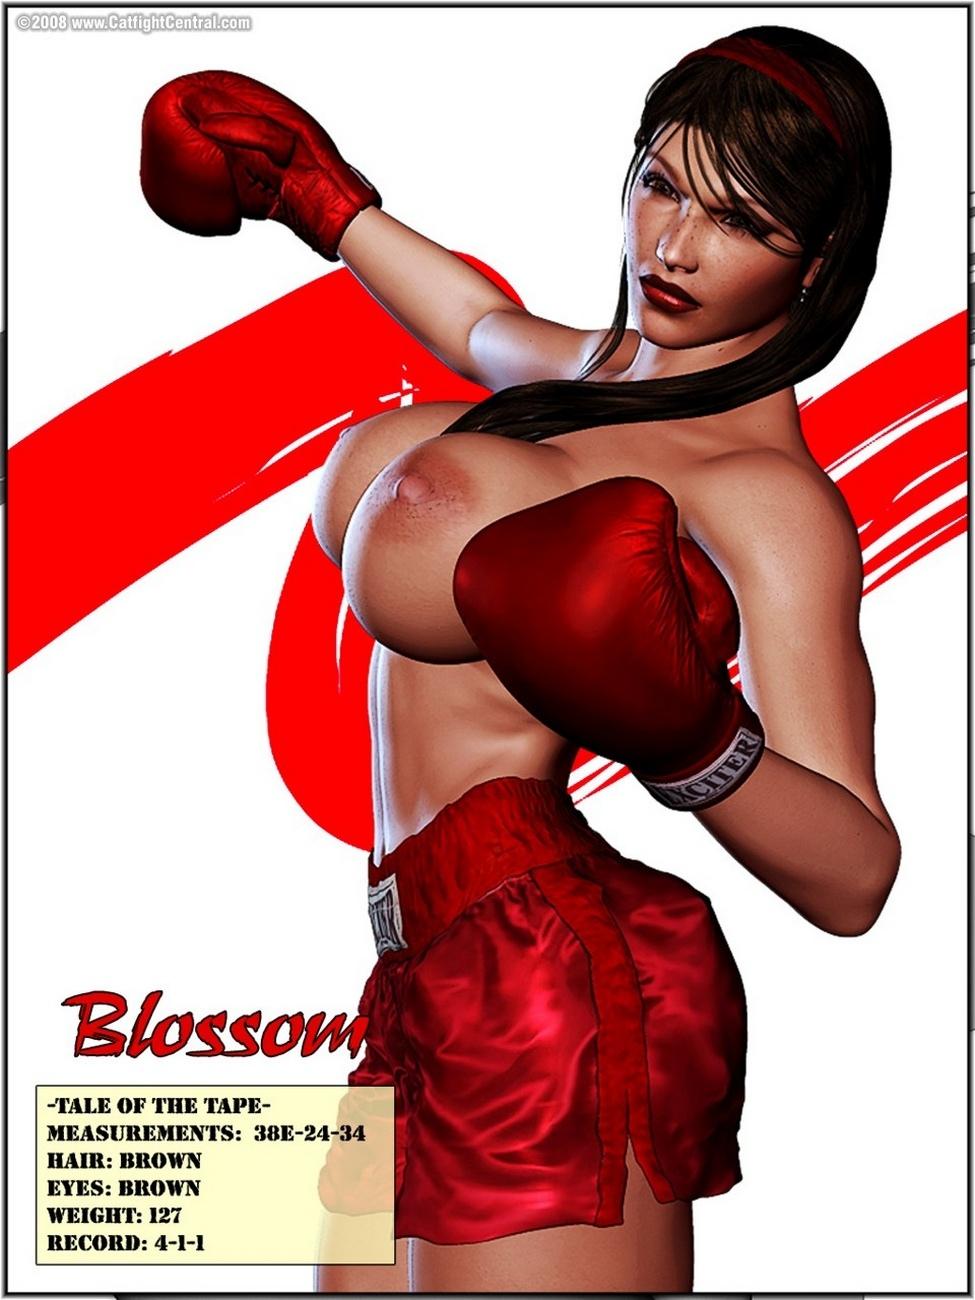 Foxy Boxing 1 - Blossom Vs Julie - Roundch